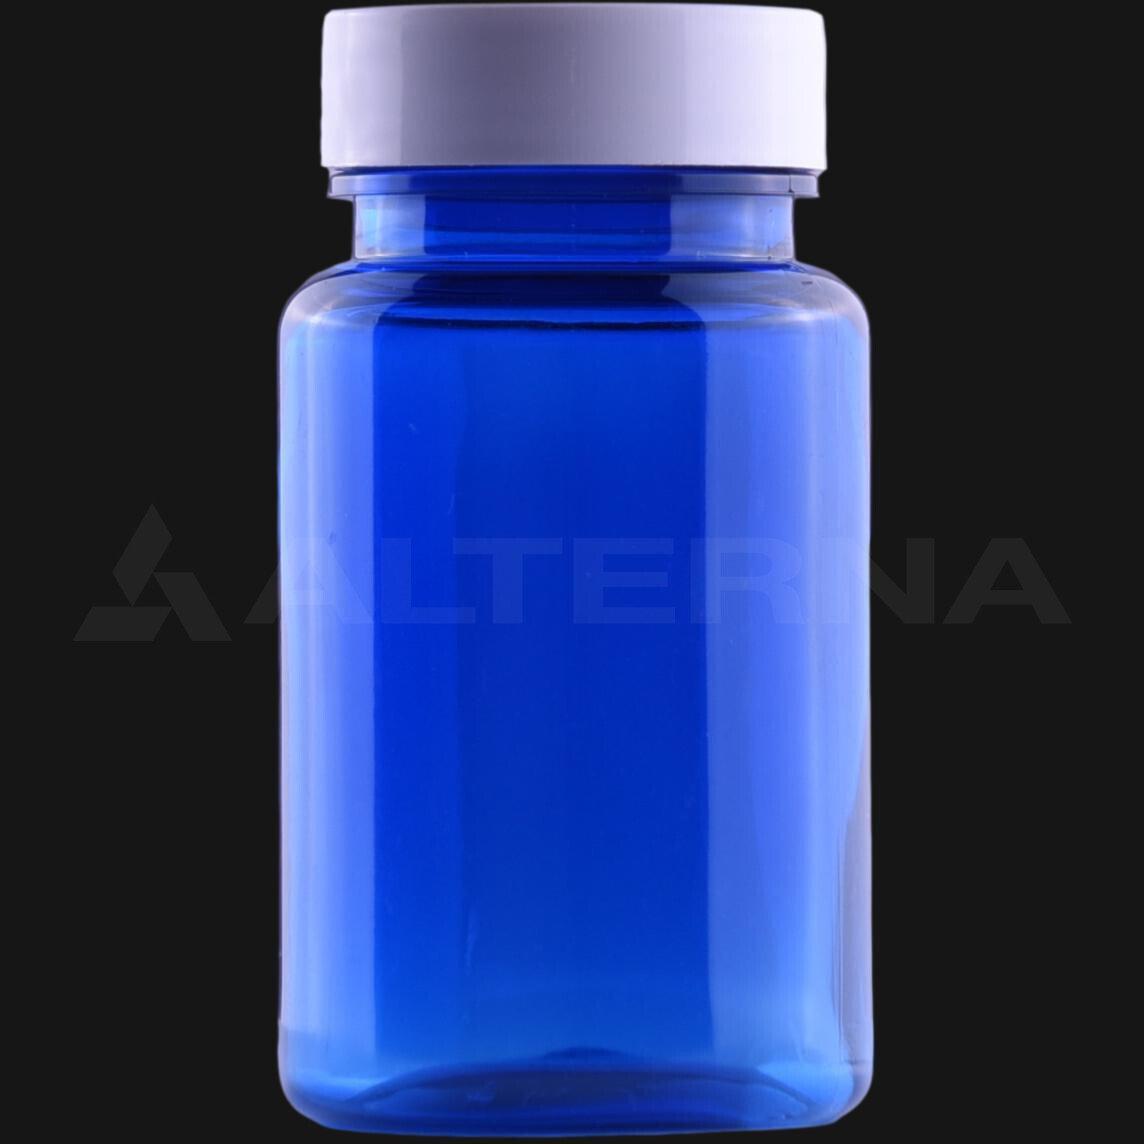 100 ml PET Pill Bottle with 38 mm Alu. Foil Seal Cap